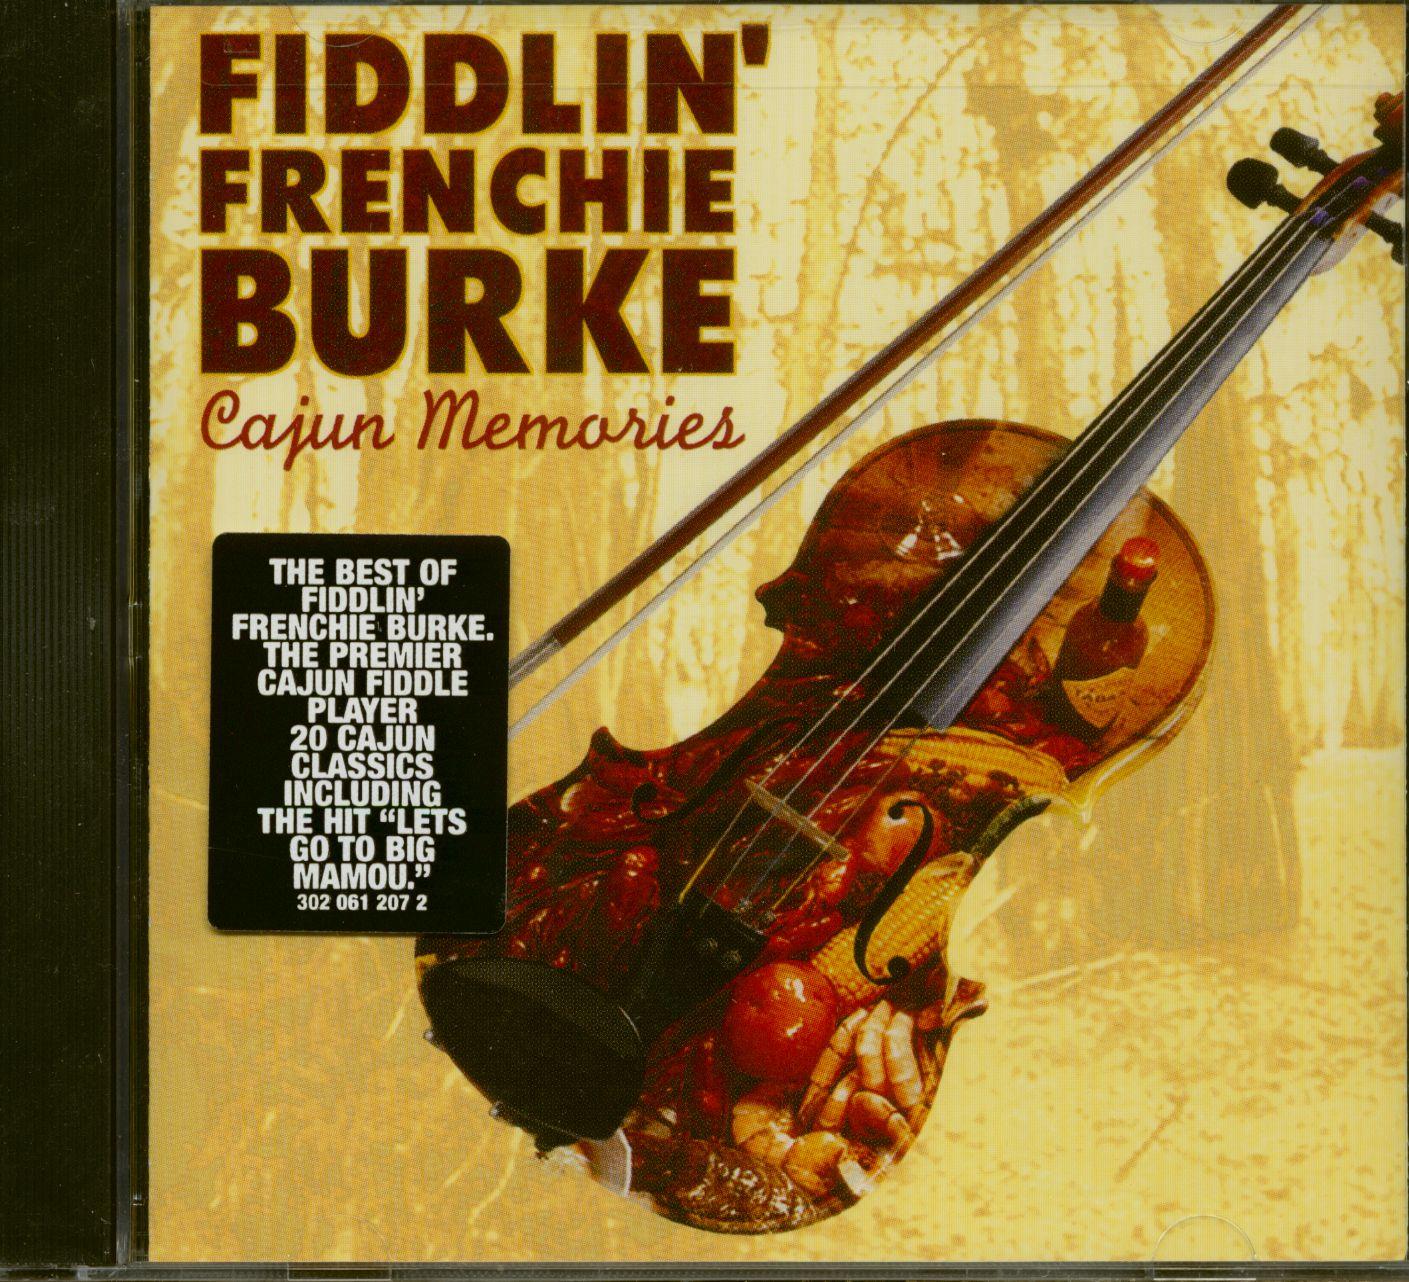 Fiddlin' Frenchie Burke - The Best Of Fiddlin' Frenchie Burke